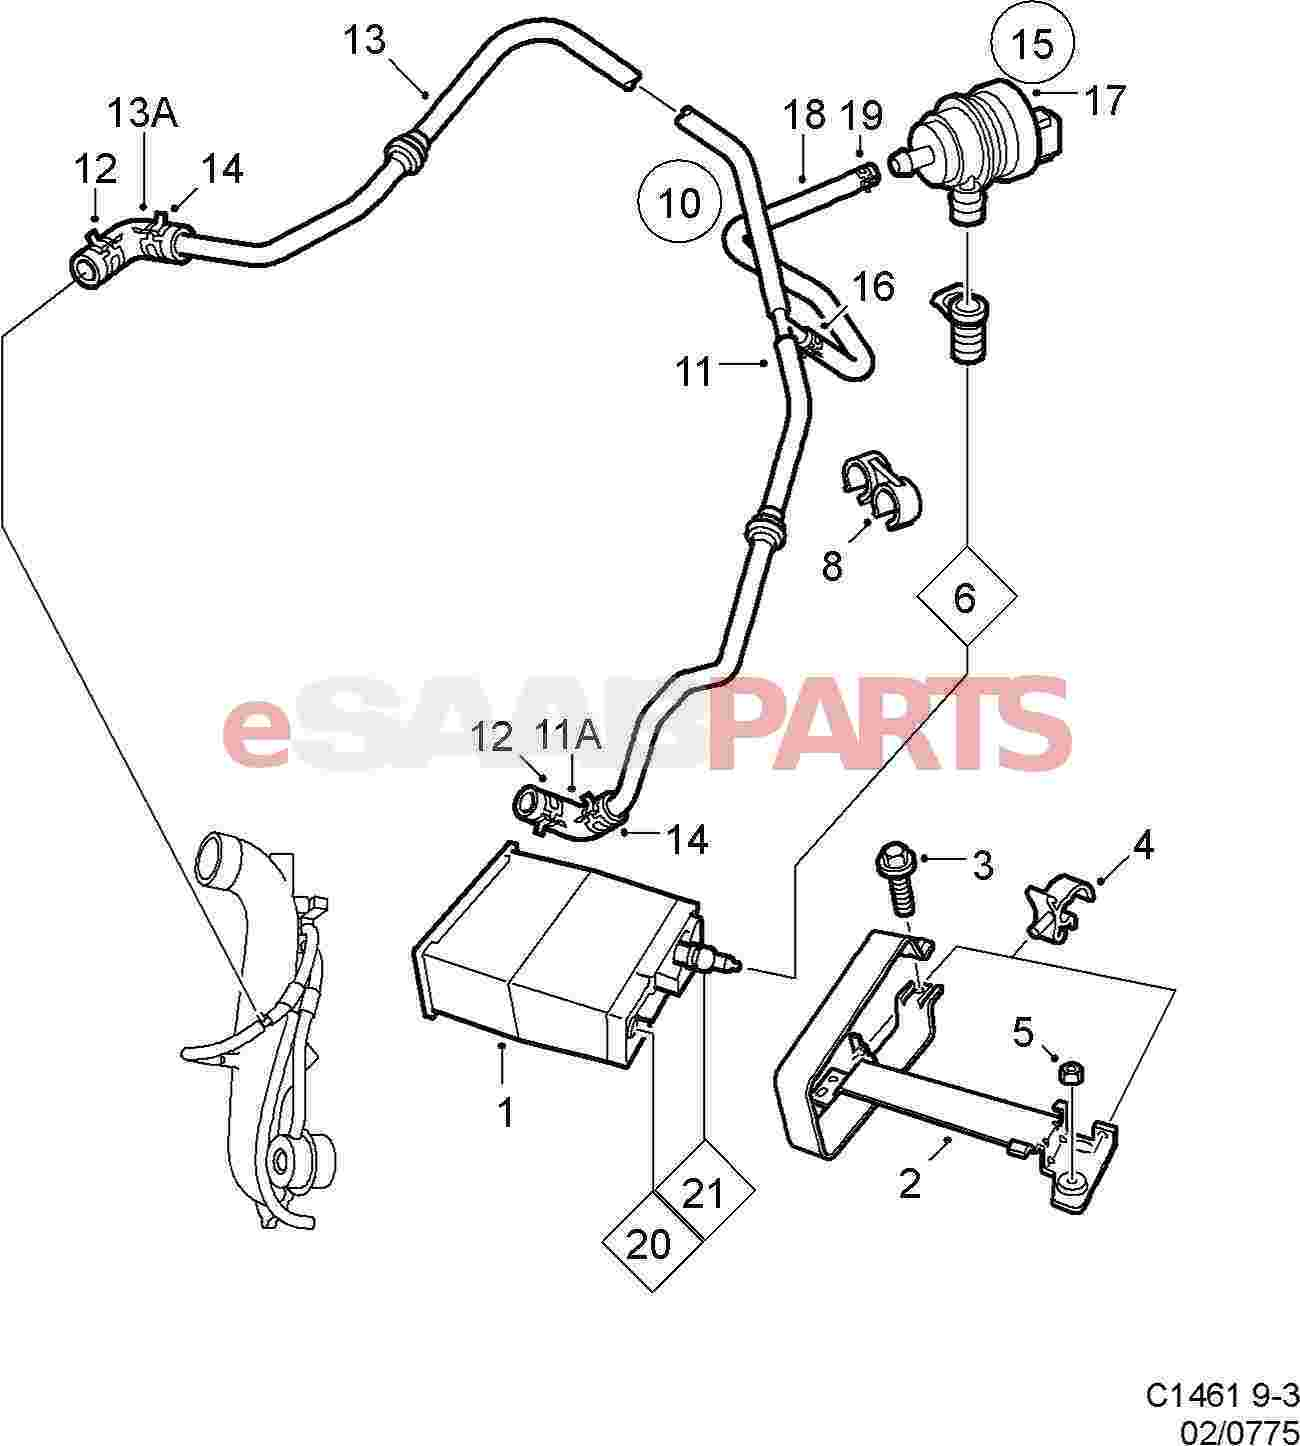 4670477 saab evap canister purge valve genuine saab parts from rh esaabparts com Fuel Evap System Diagram Evap Emission Control System